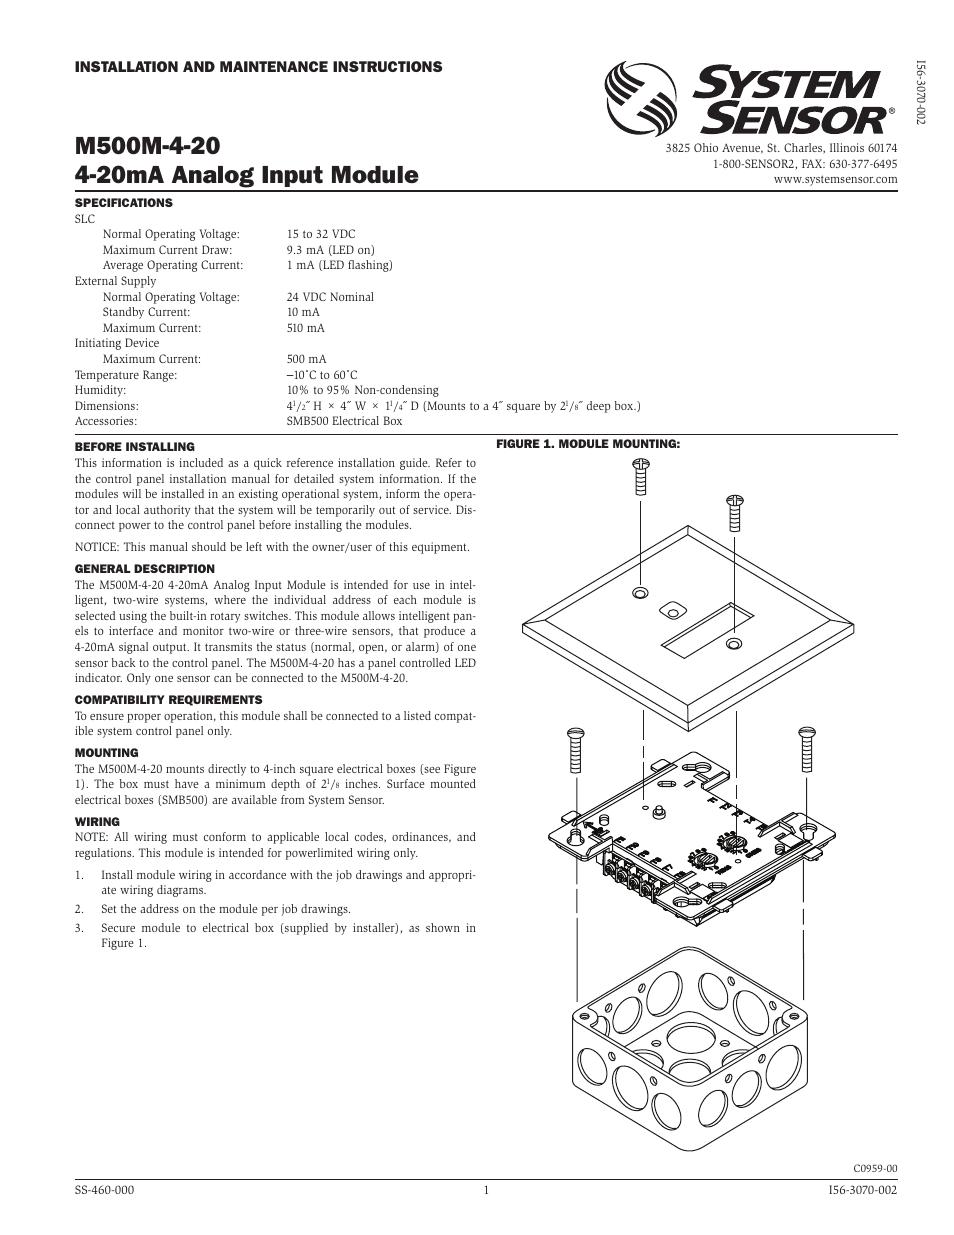 System Sensor M500m 4 20 User Manual 2 Pages Led Module Wiring Diagram